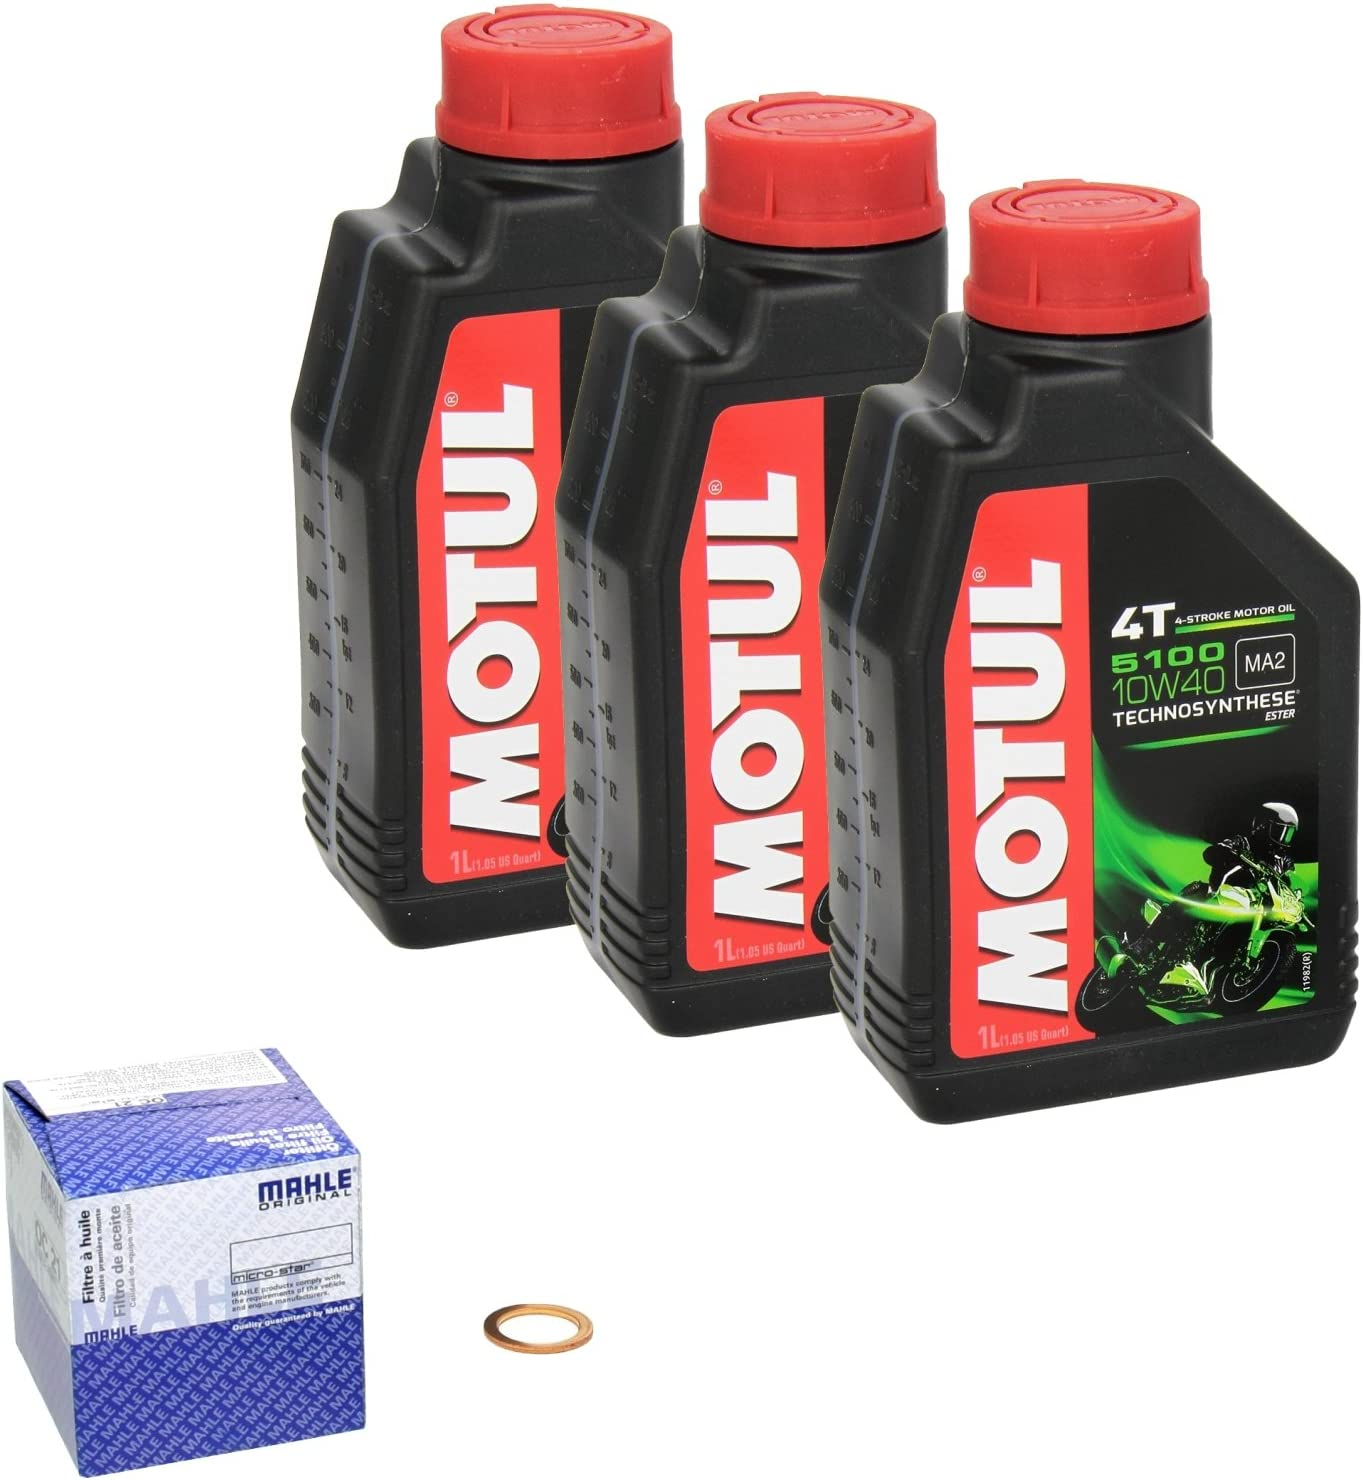 Motul 5100 10w 40 Ölwechsel Set Yamaha Yzf R6 Bj 06 07 Motoröl Mahle Ölfilter Und Dichtring Auto